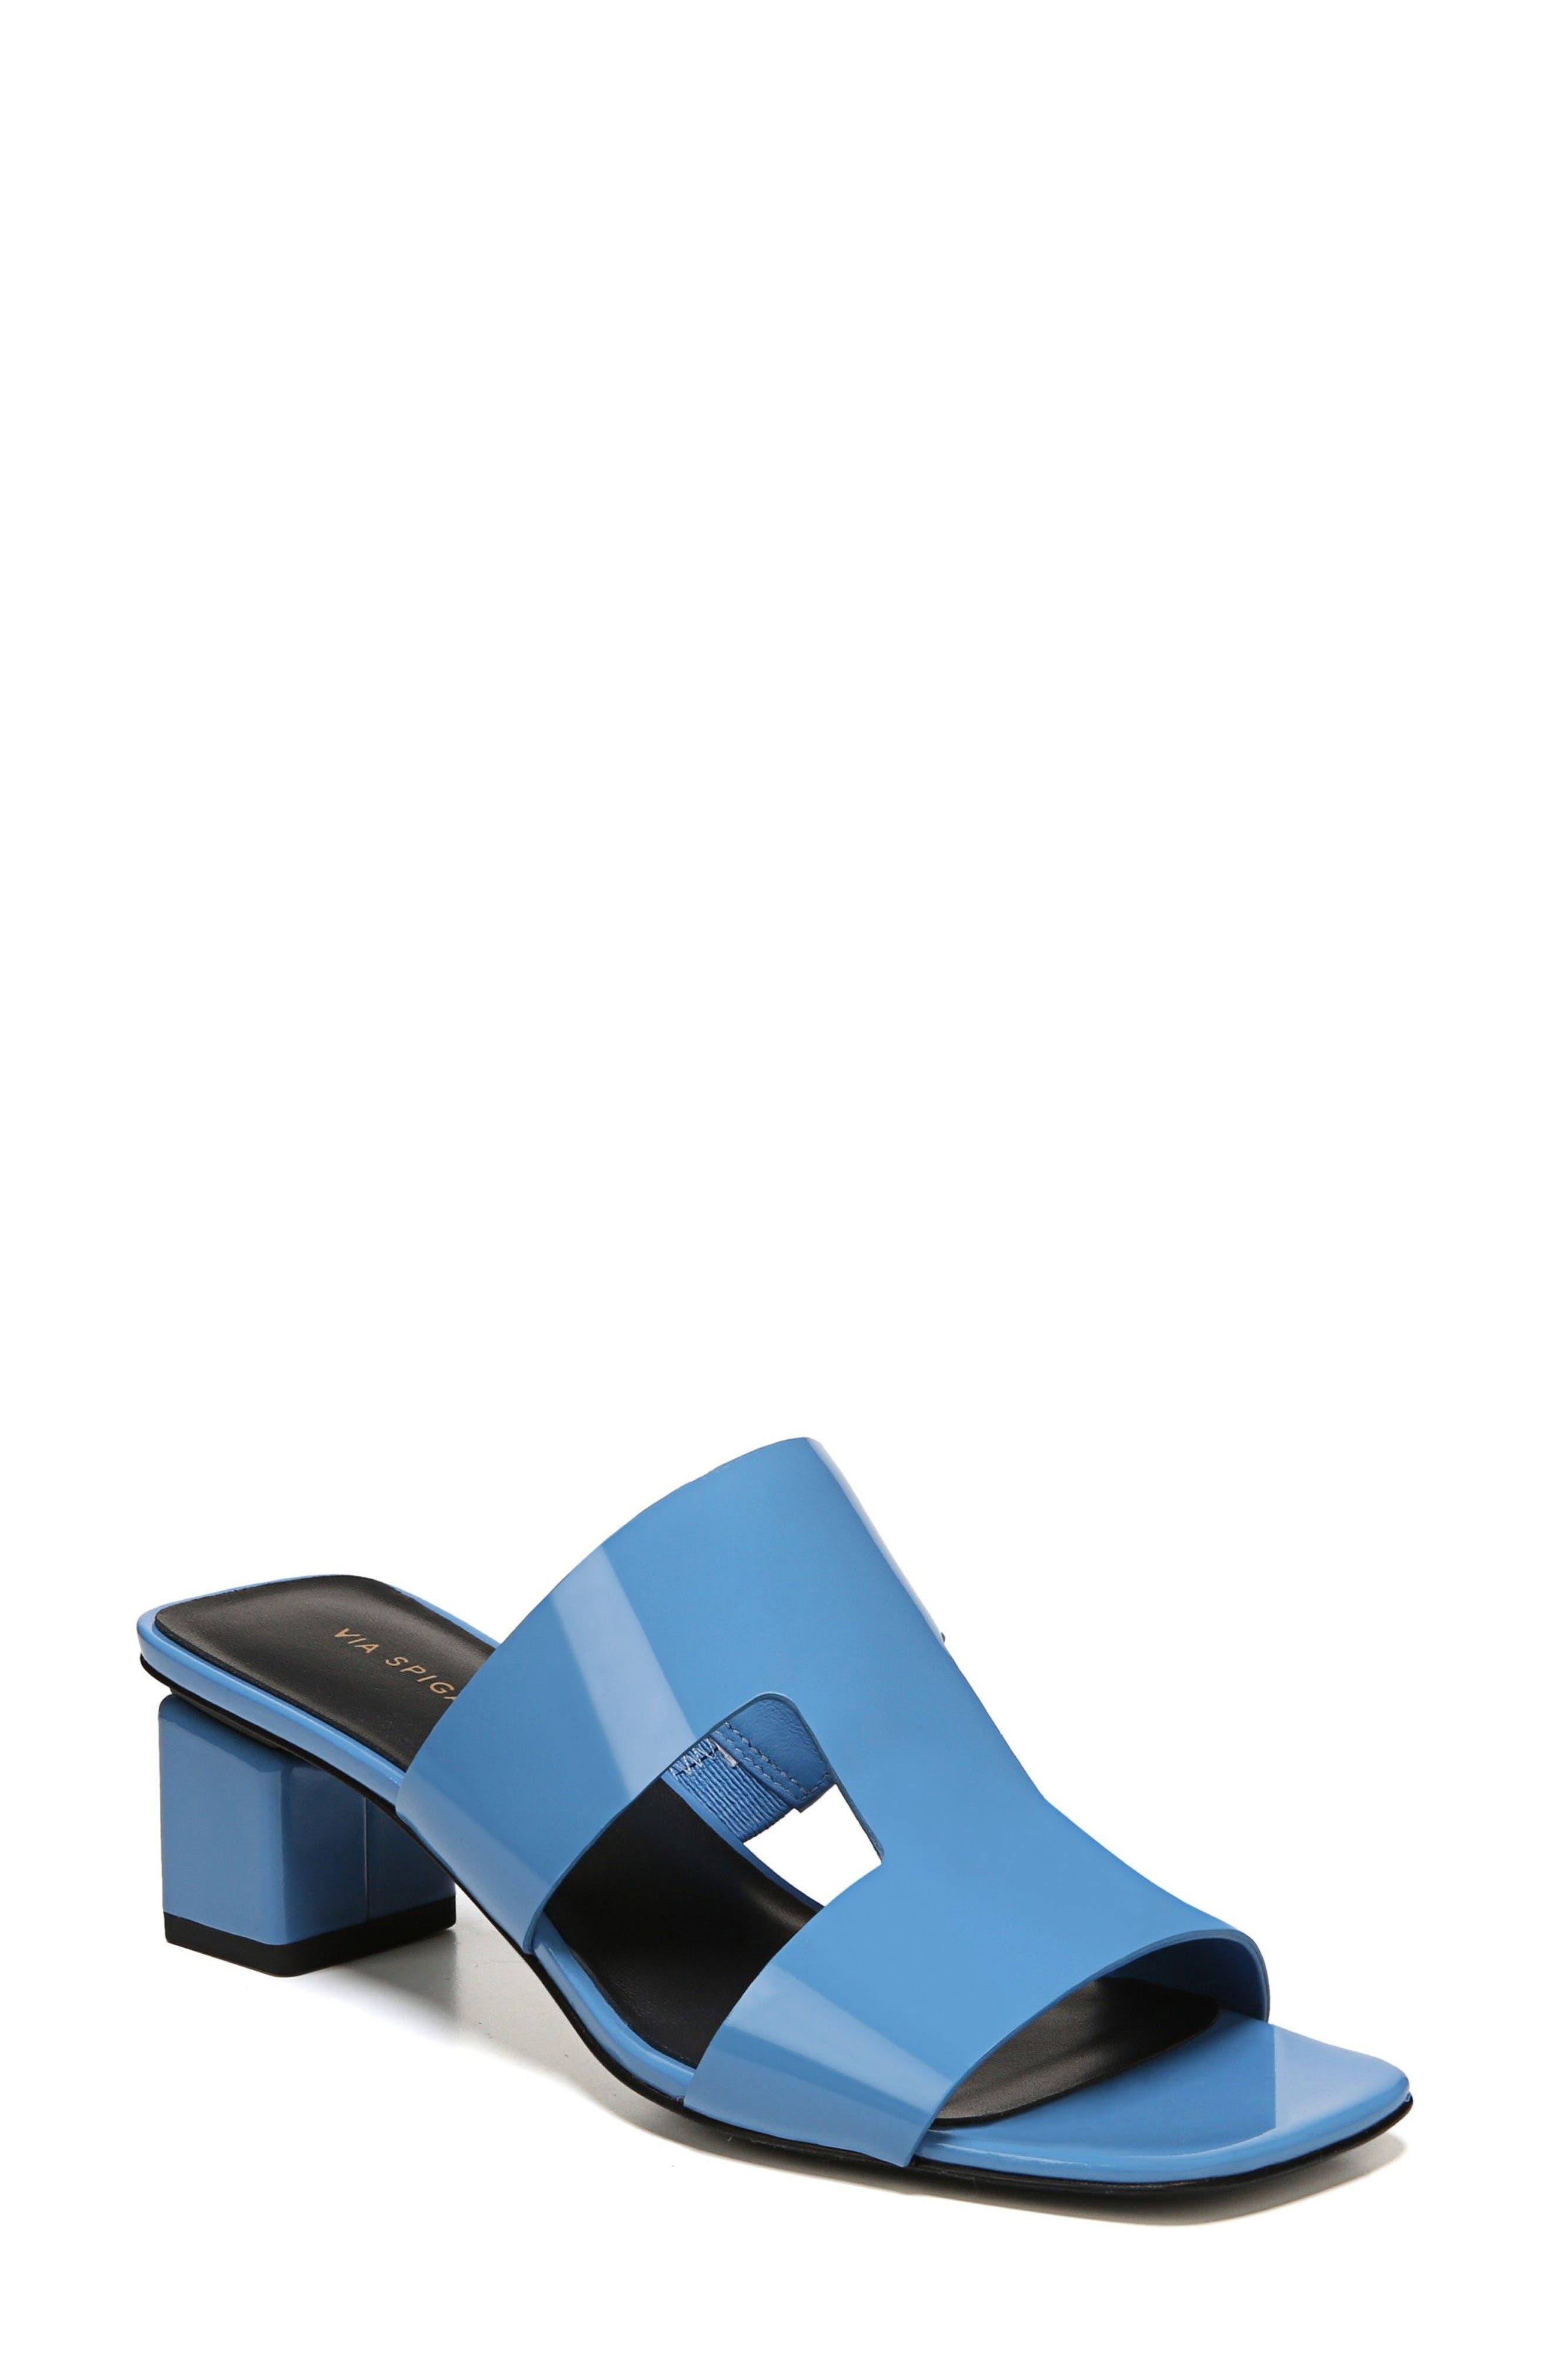 Florence Sandal,                             Main thumbnail 1, color,                             Sky Patent Leather